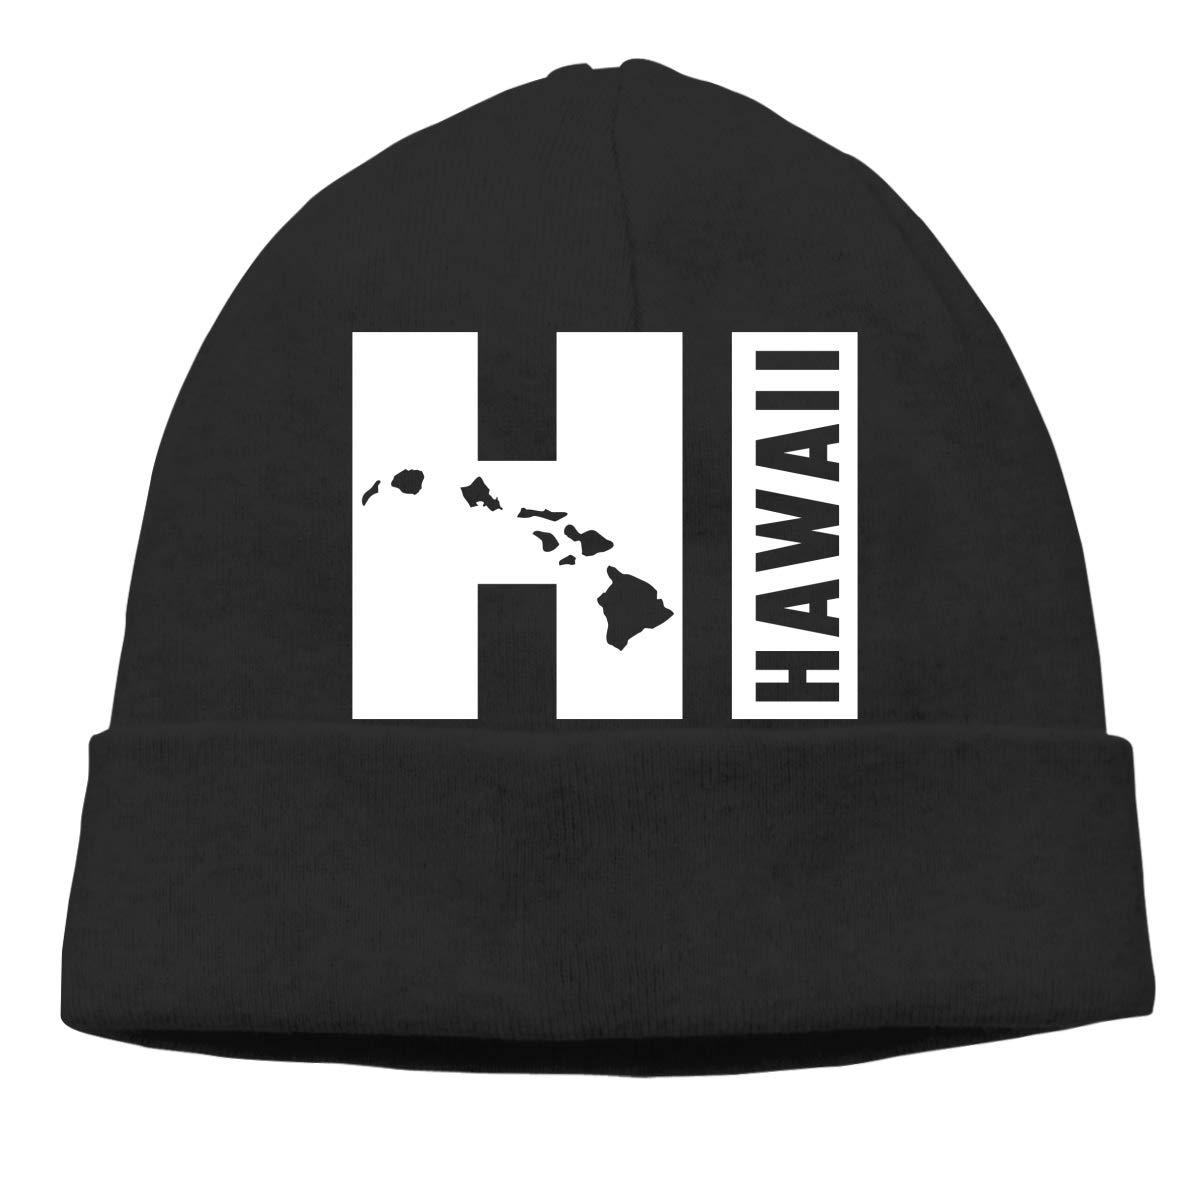 Unisex Knit Hat Creative Hawaiian Beautiful Sticker2 Print Hats Soft Stretch Beanies Black